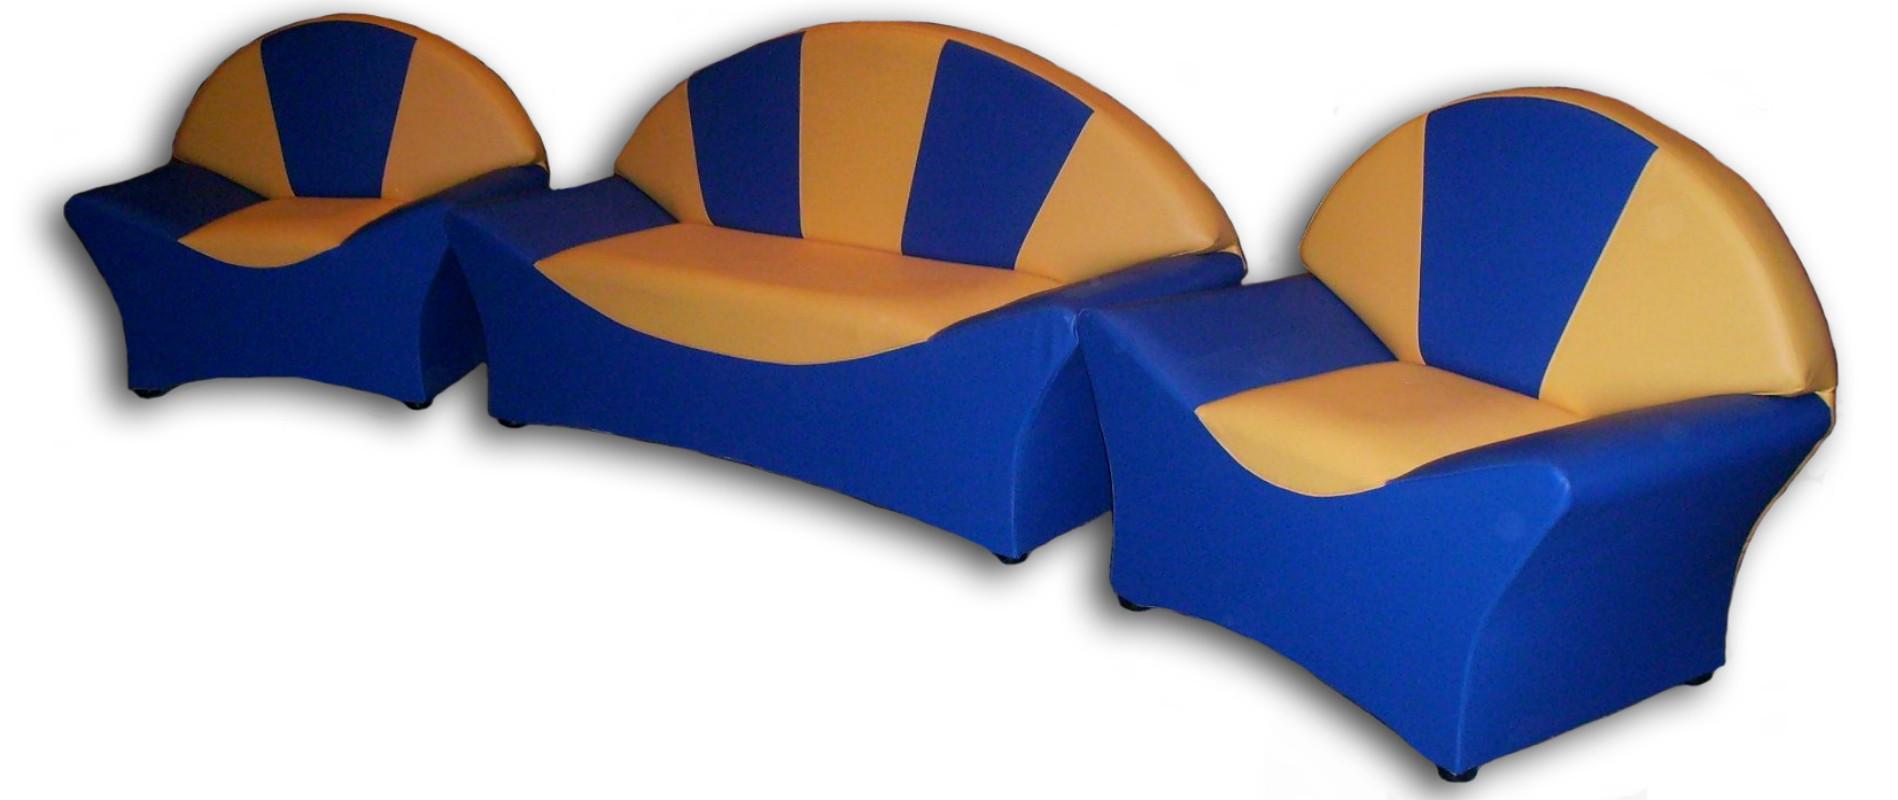 "Комплект мягкой мебели ""нептун"", цена 13 310,00 руб. - диван."